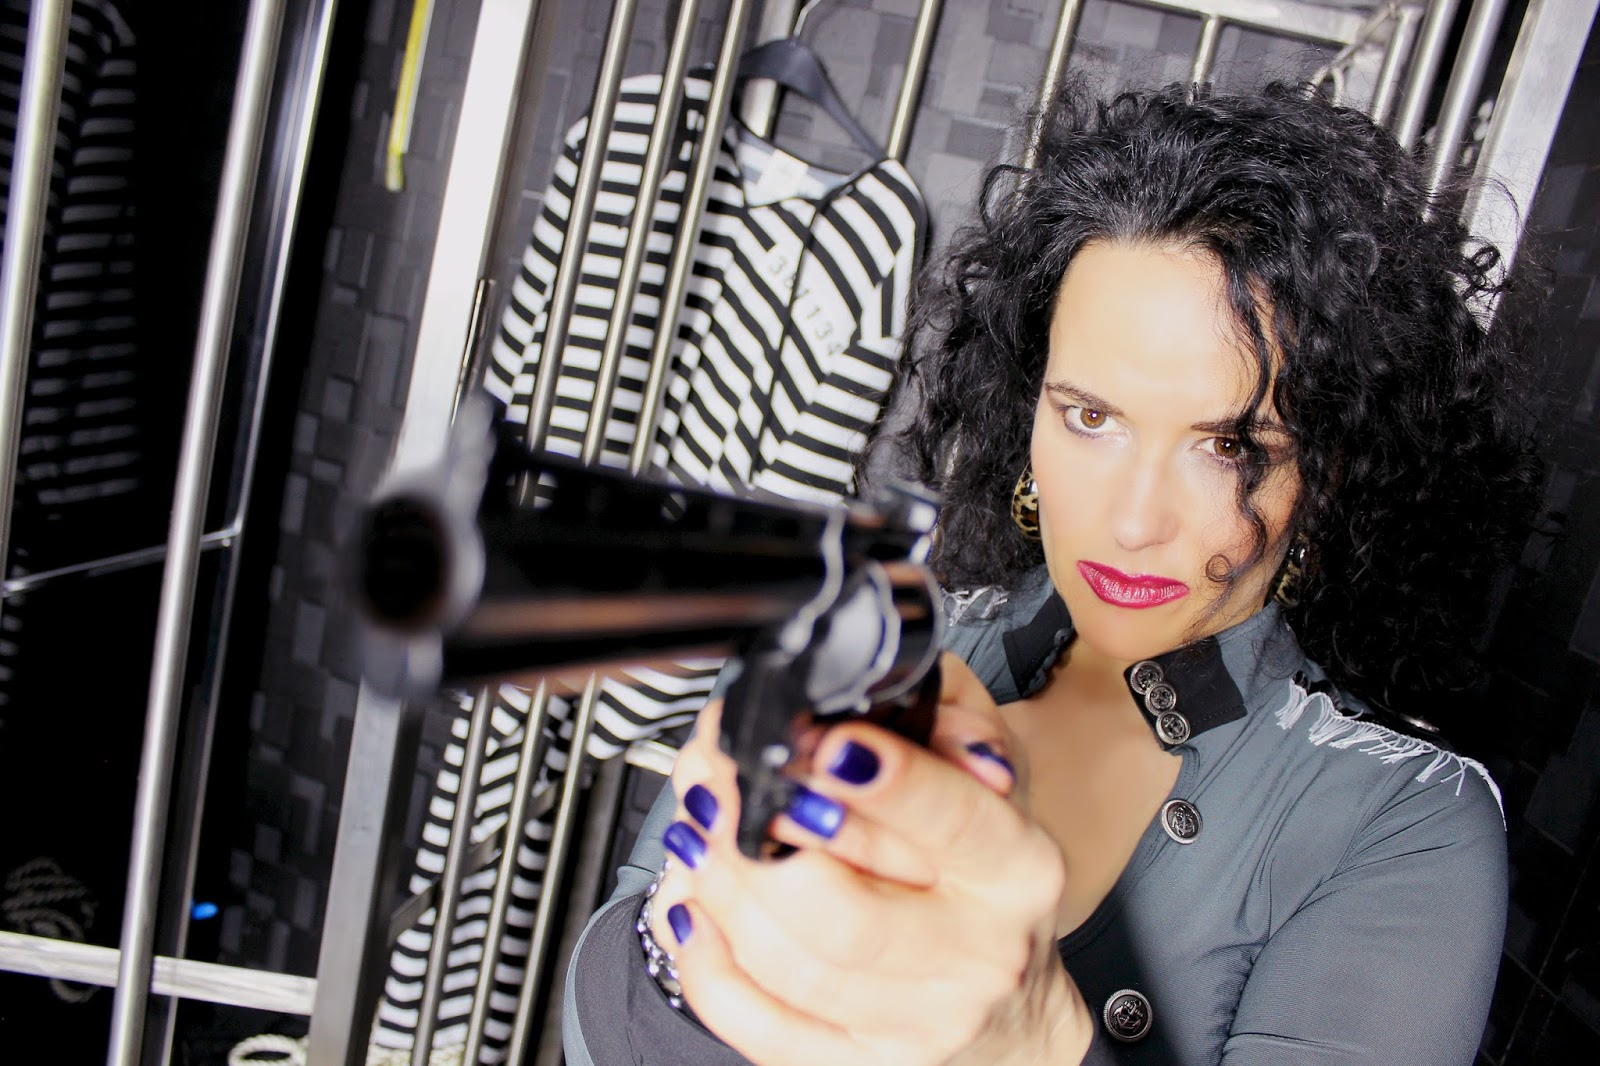 Polizistin Alina Sommer